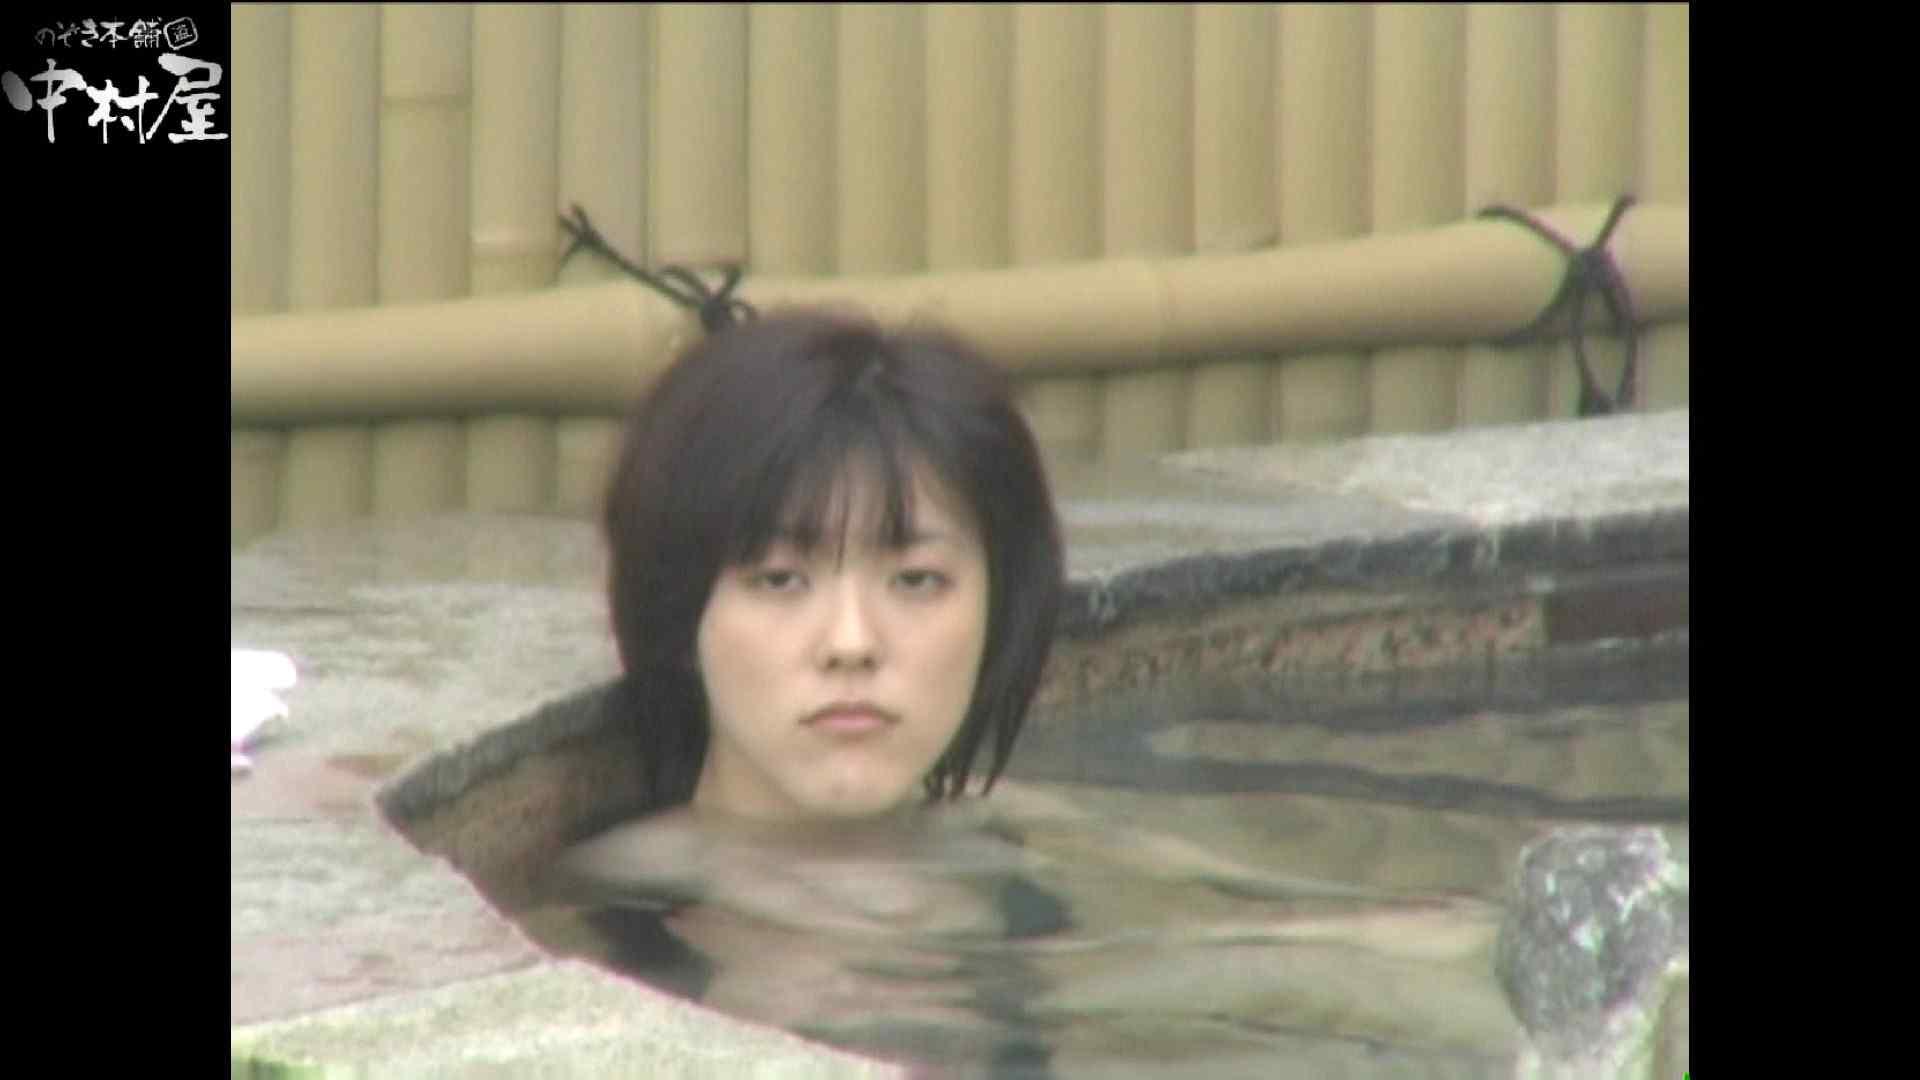 Aquaな露天風呂Vol.975 HなOL | 露天  54pic 12